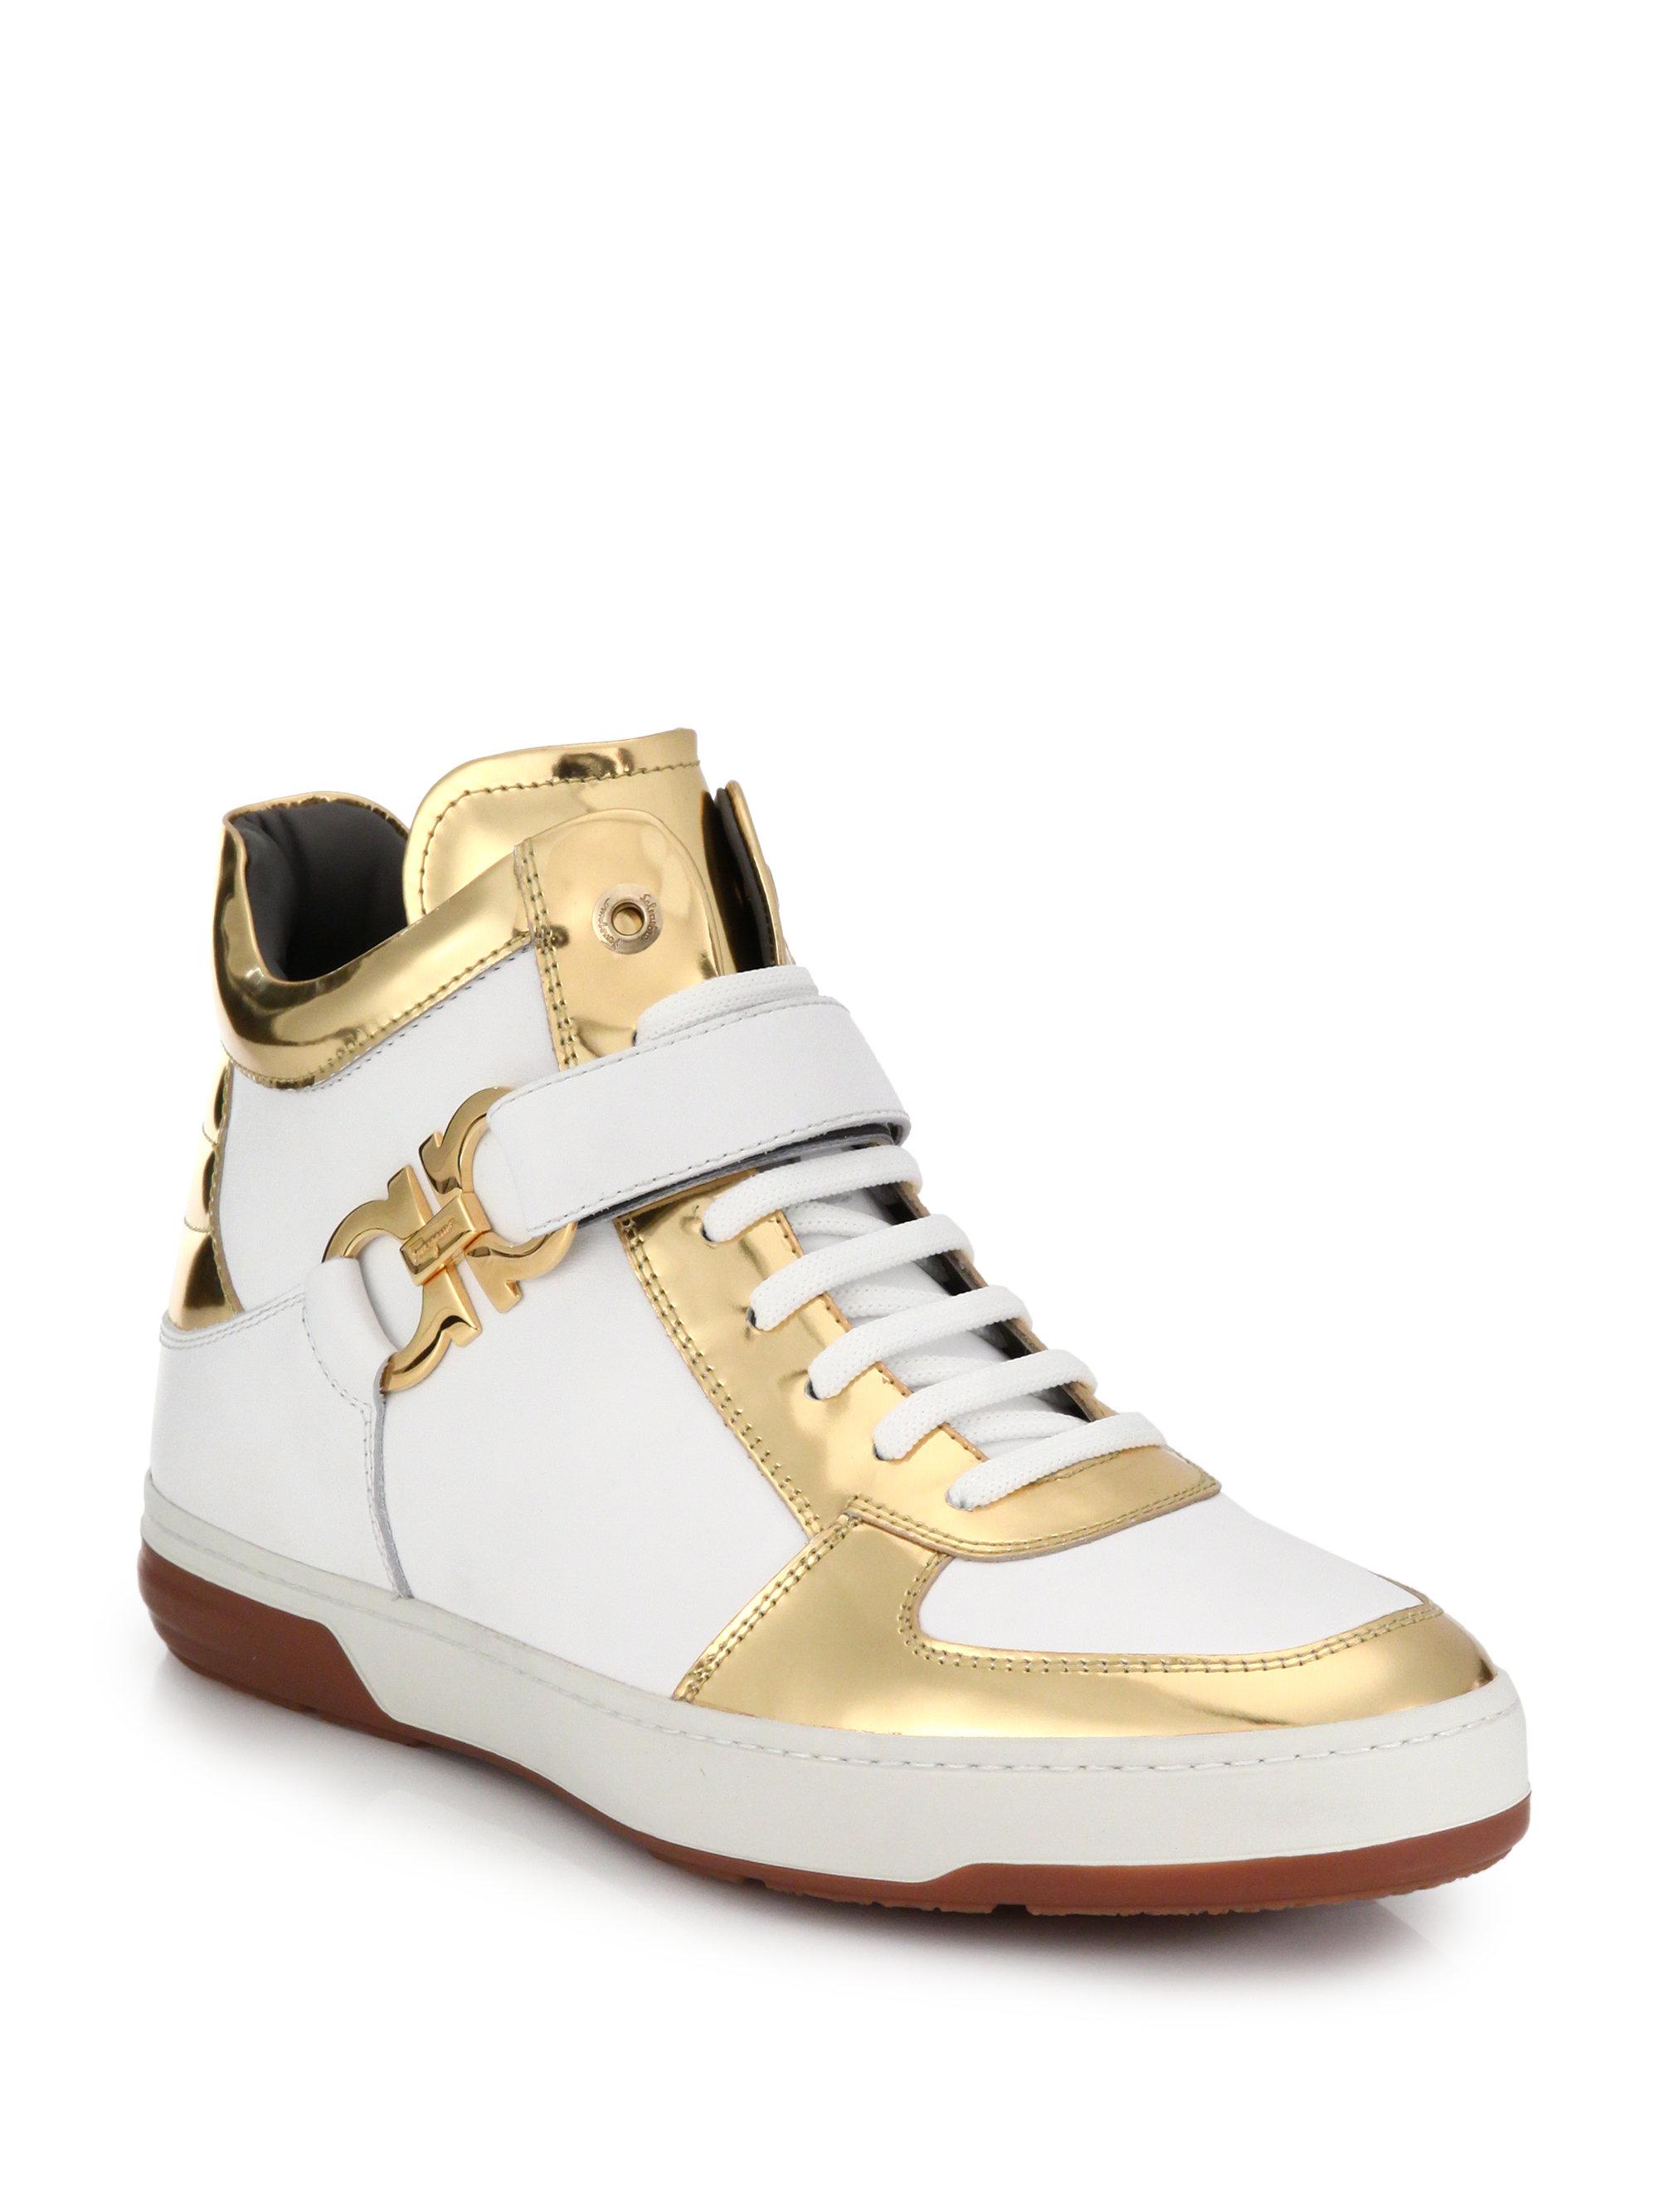 Italian High Top Shoes